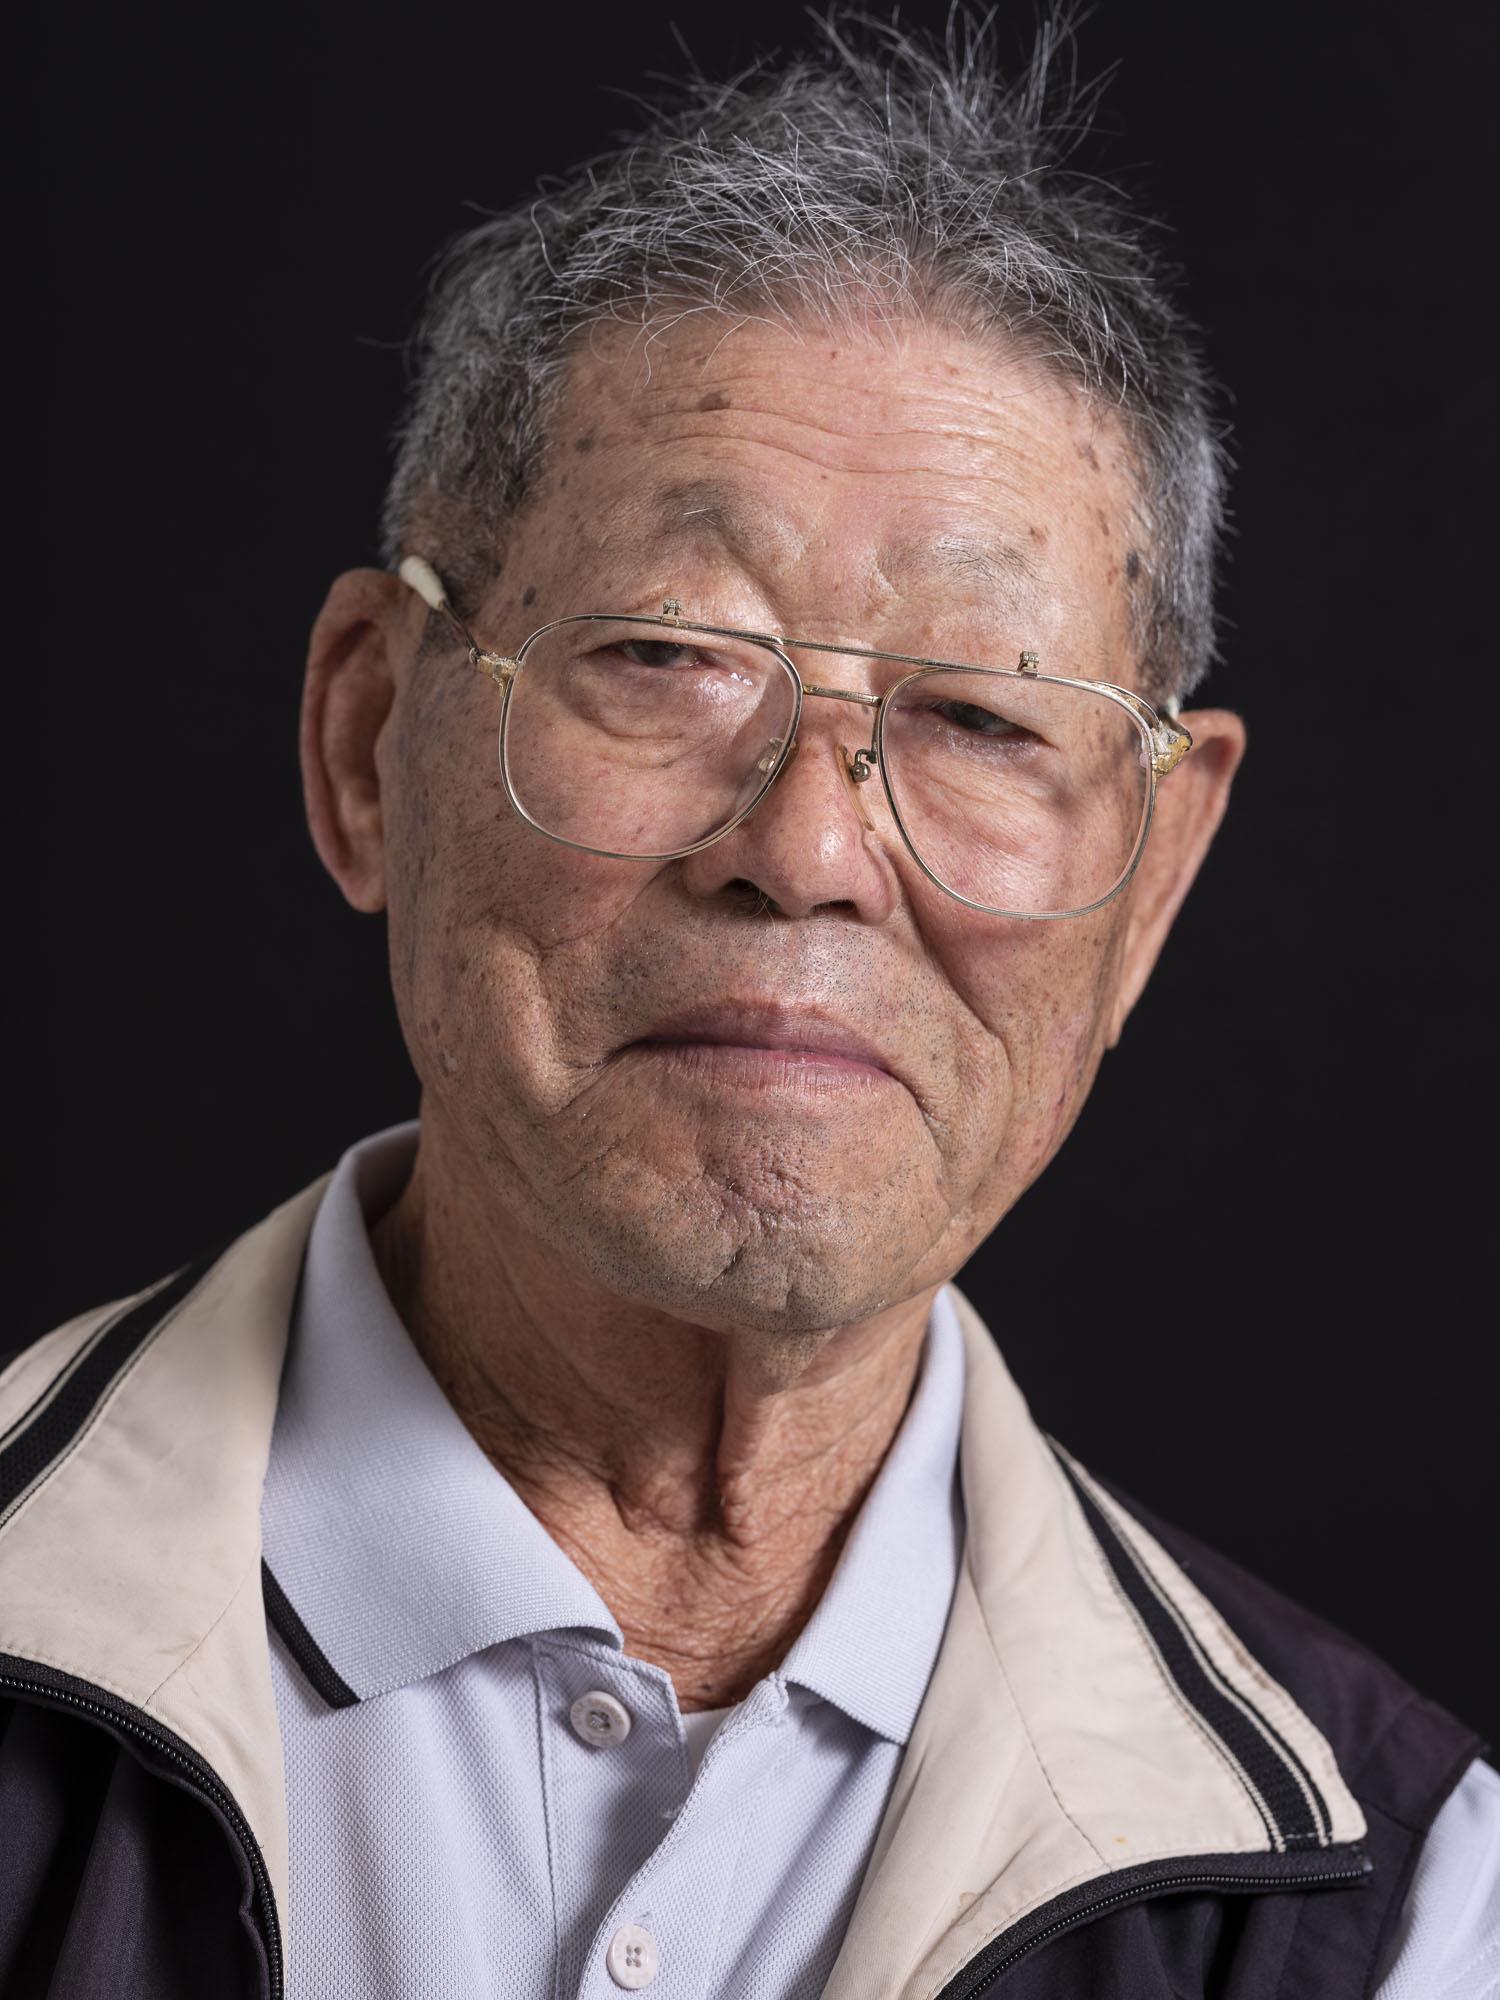 okinawa longevity centenarian people japan portrait photography project